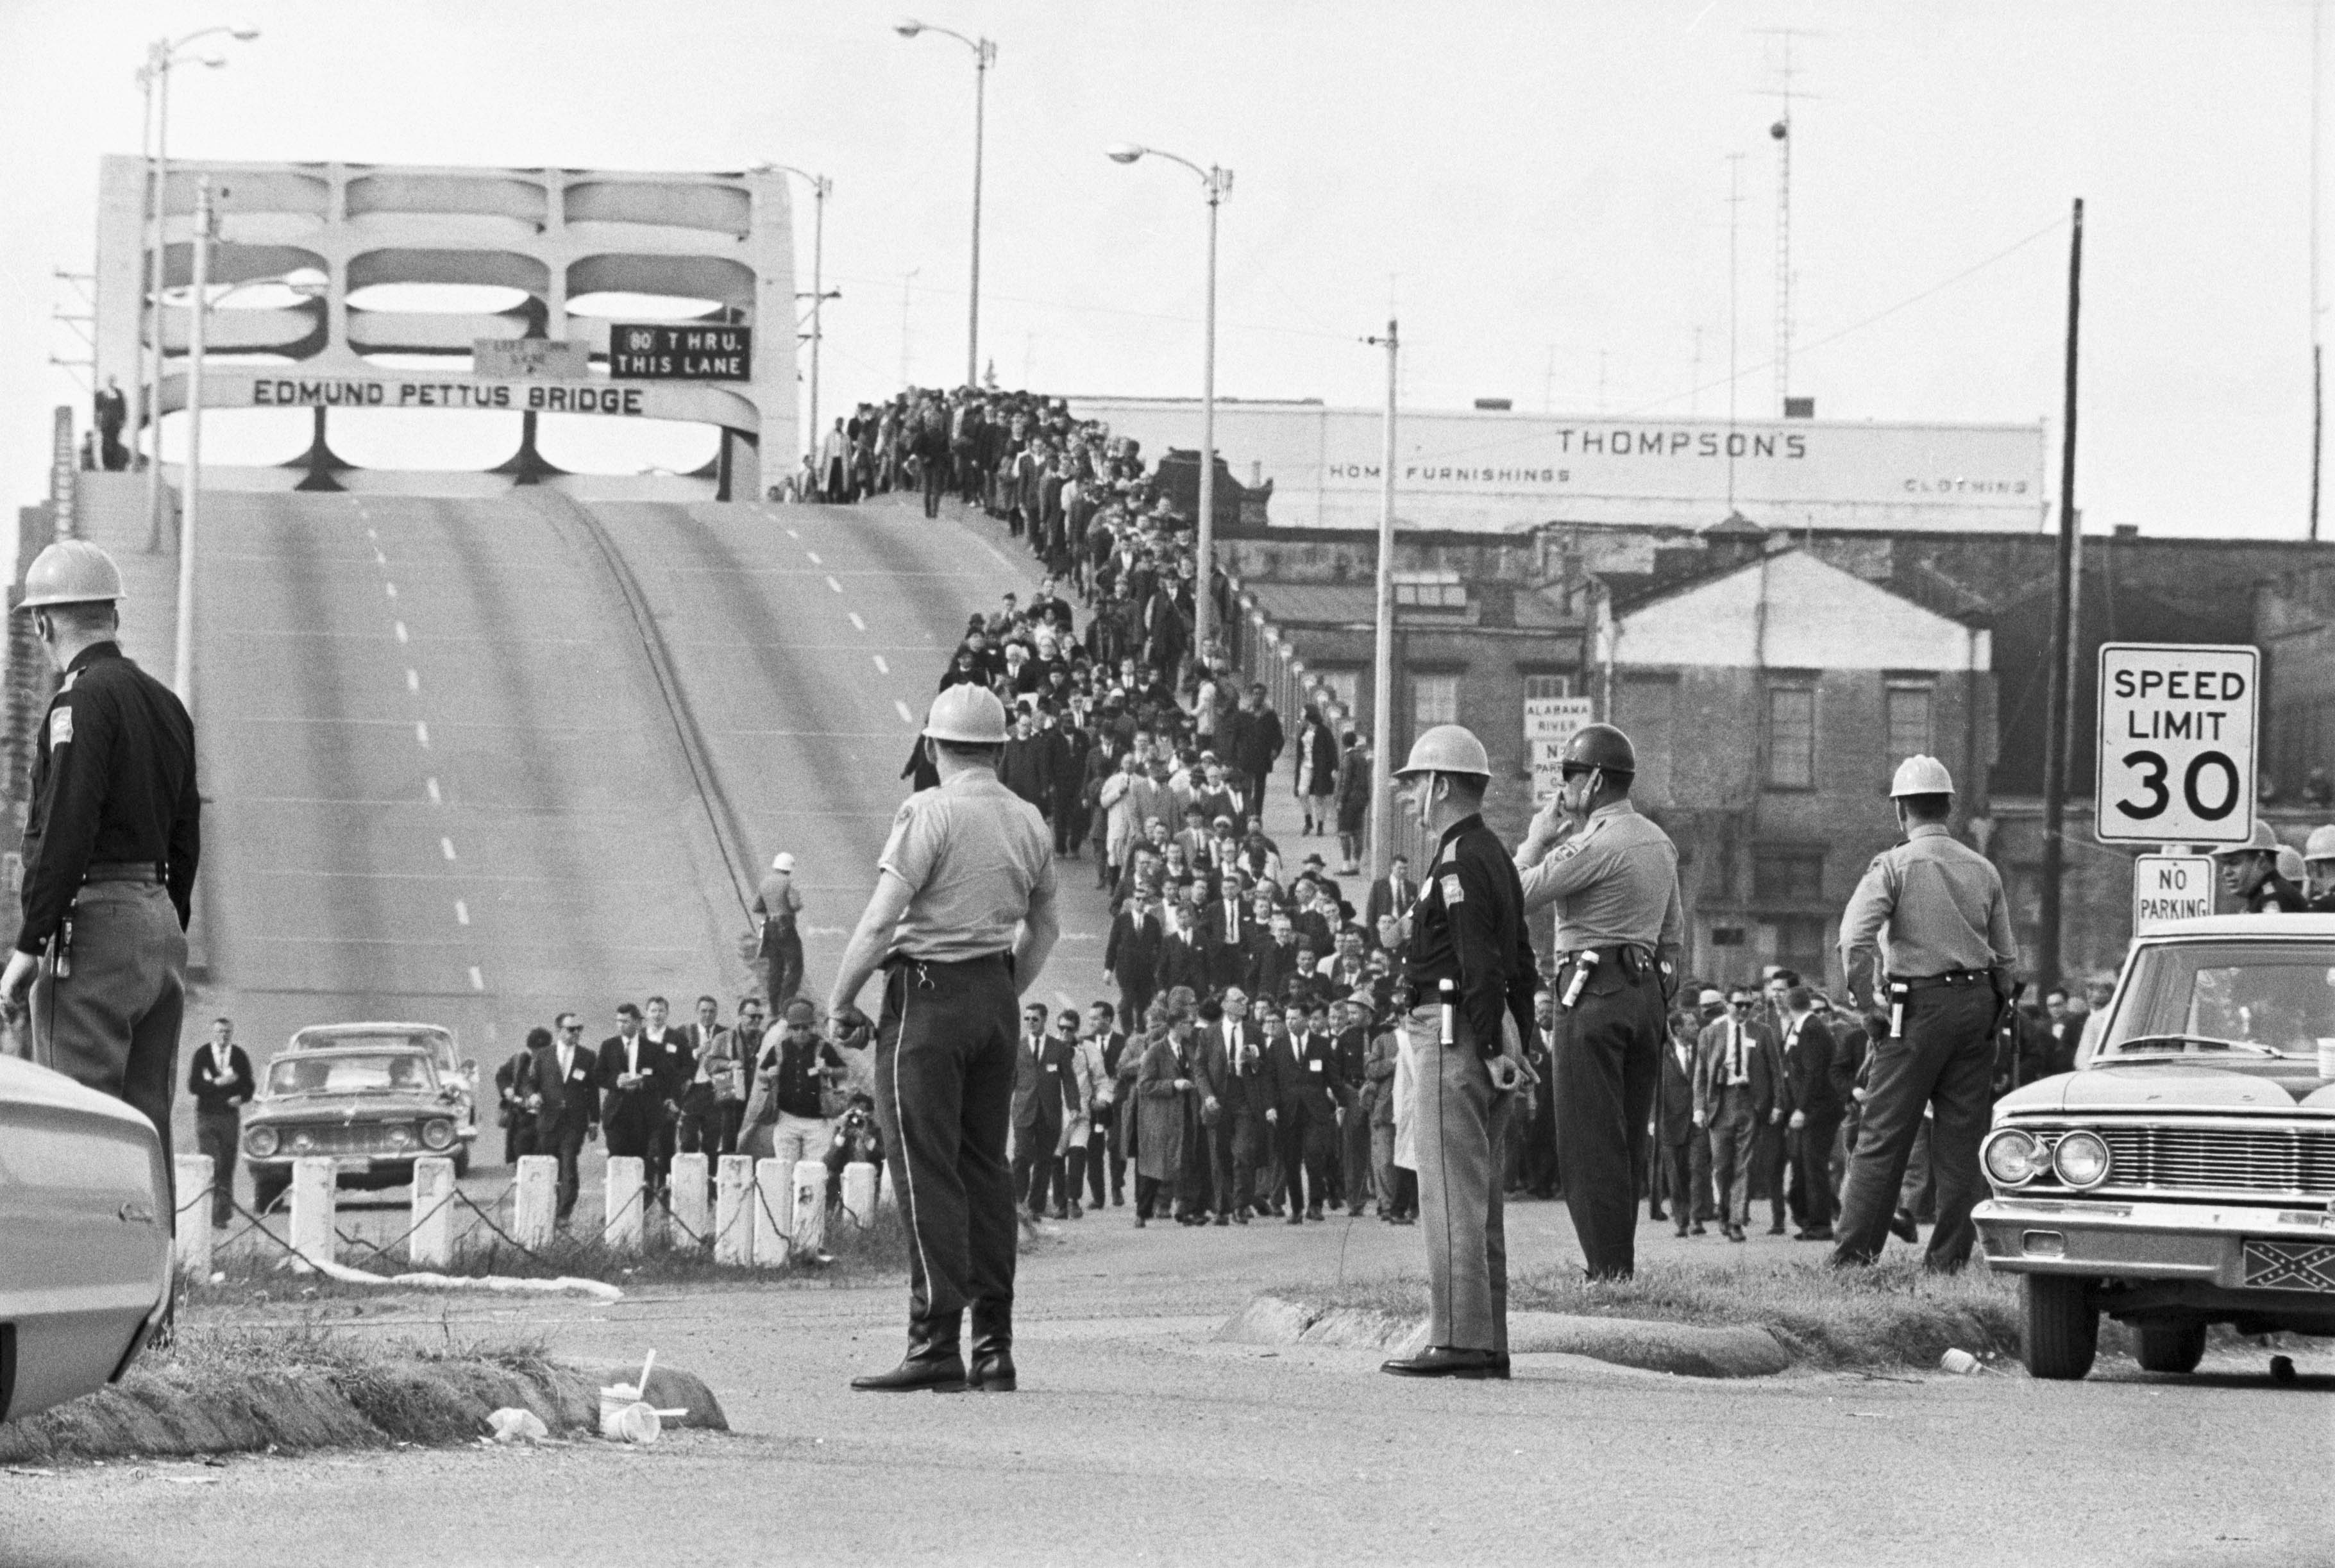 Edmund Pettus Bridge - A Second March